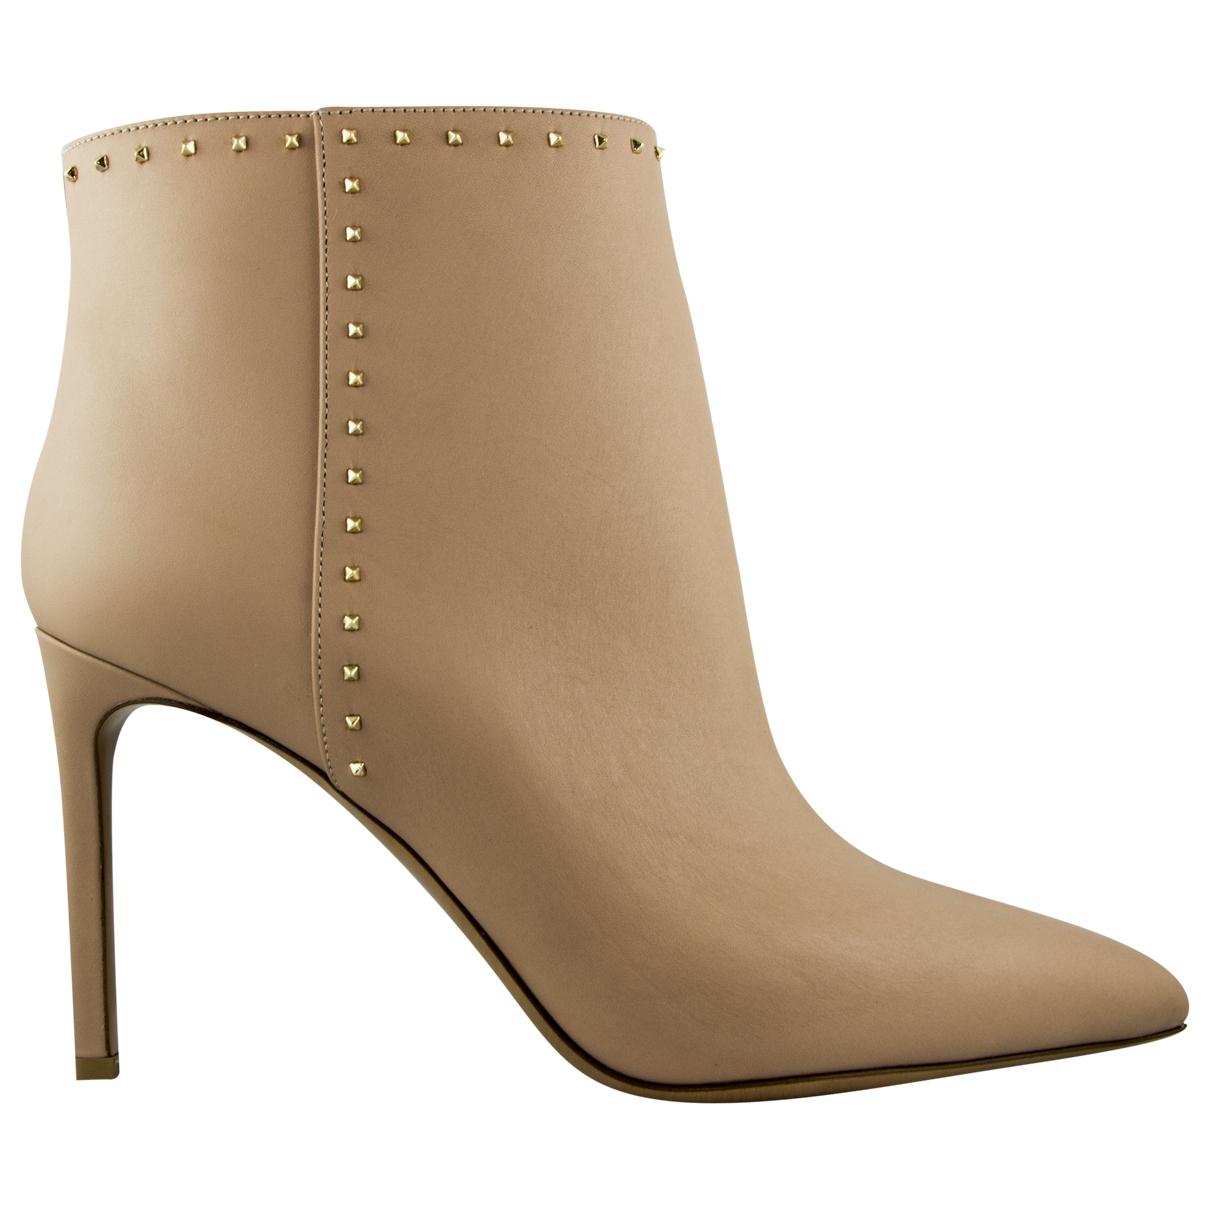 Valentino Garavani Rockstud Leather Ankle boots for Women 40 EU